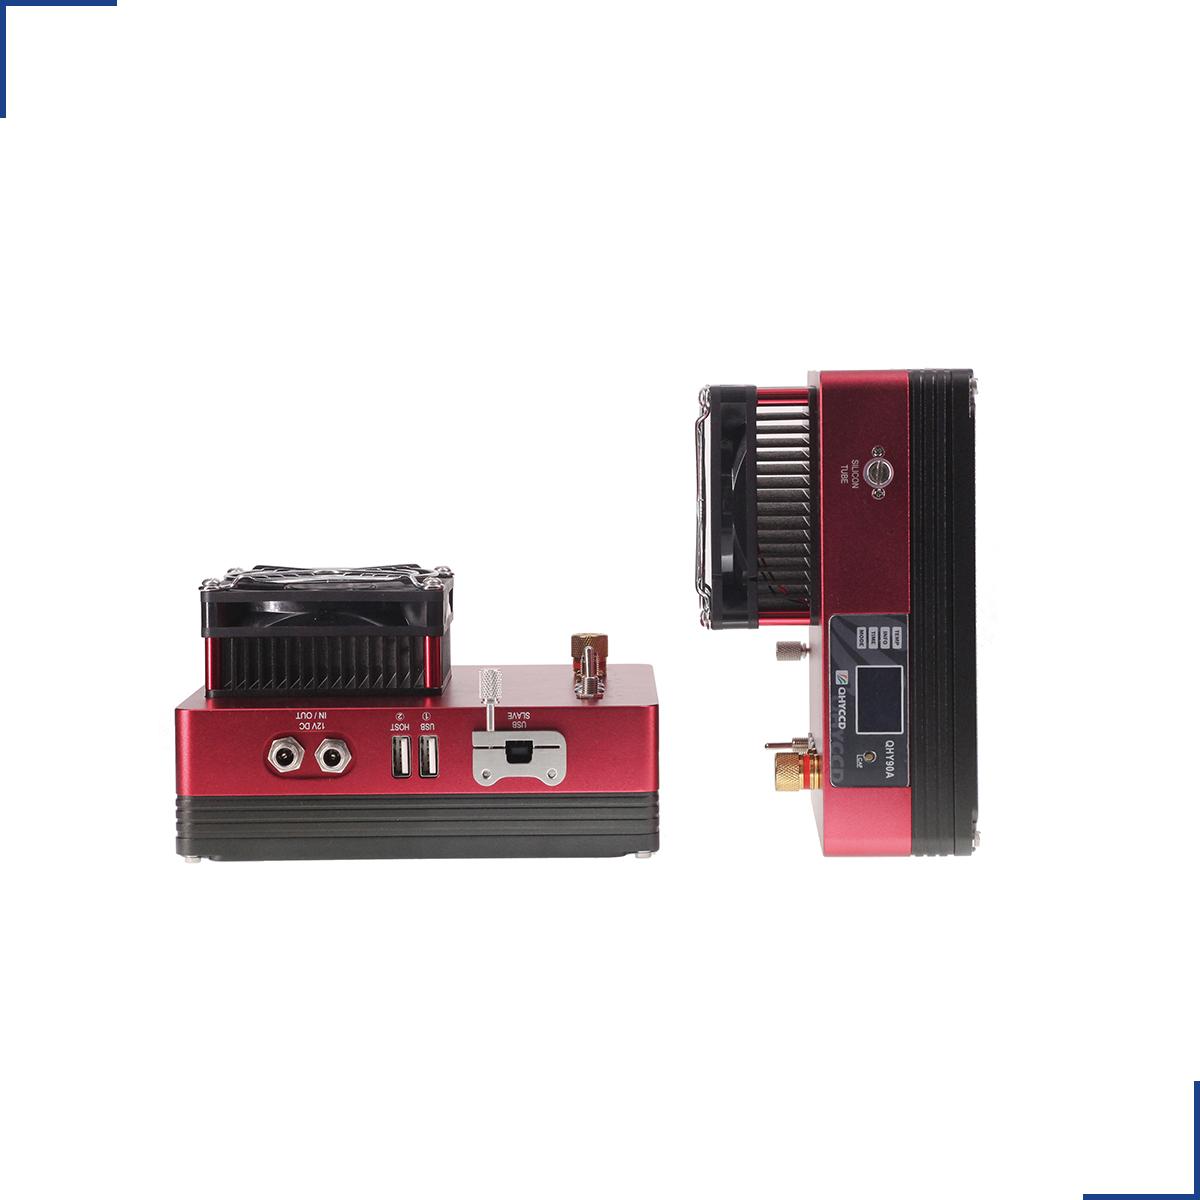 A系列 CCD 相机